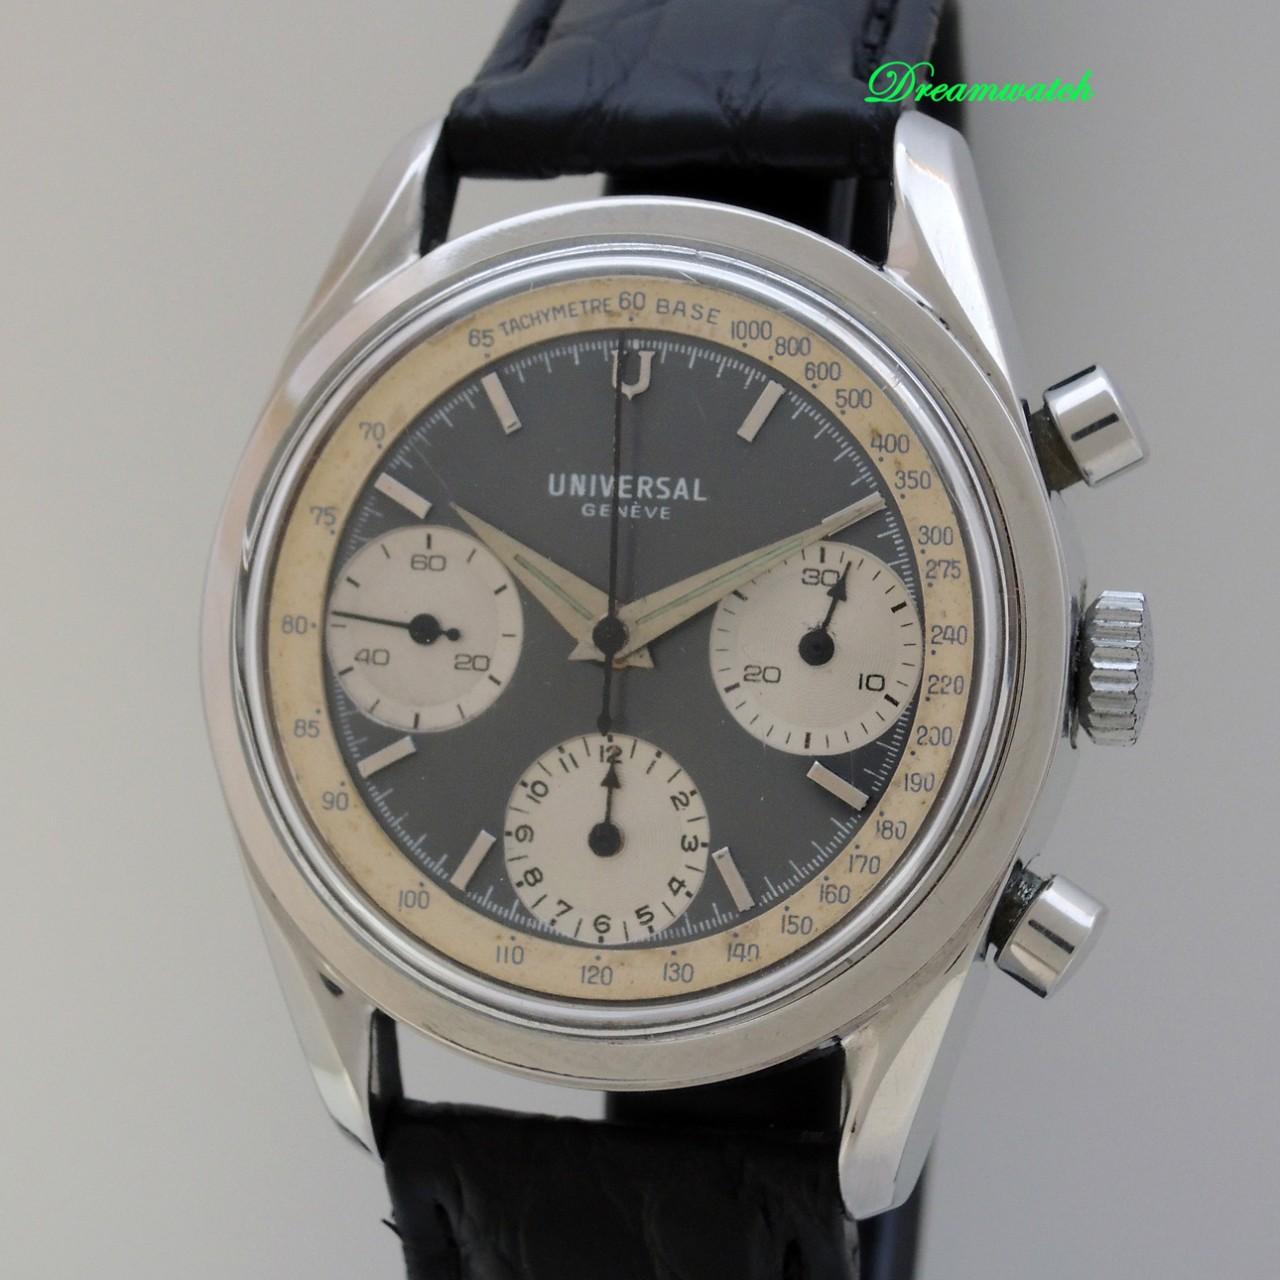 Universal Geneve Vintage Chronograph Cal.130/ - Valjoux 72